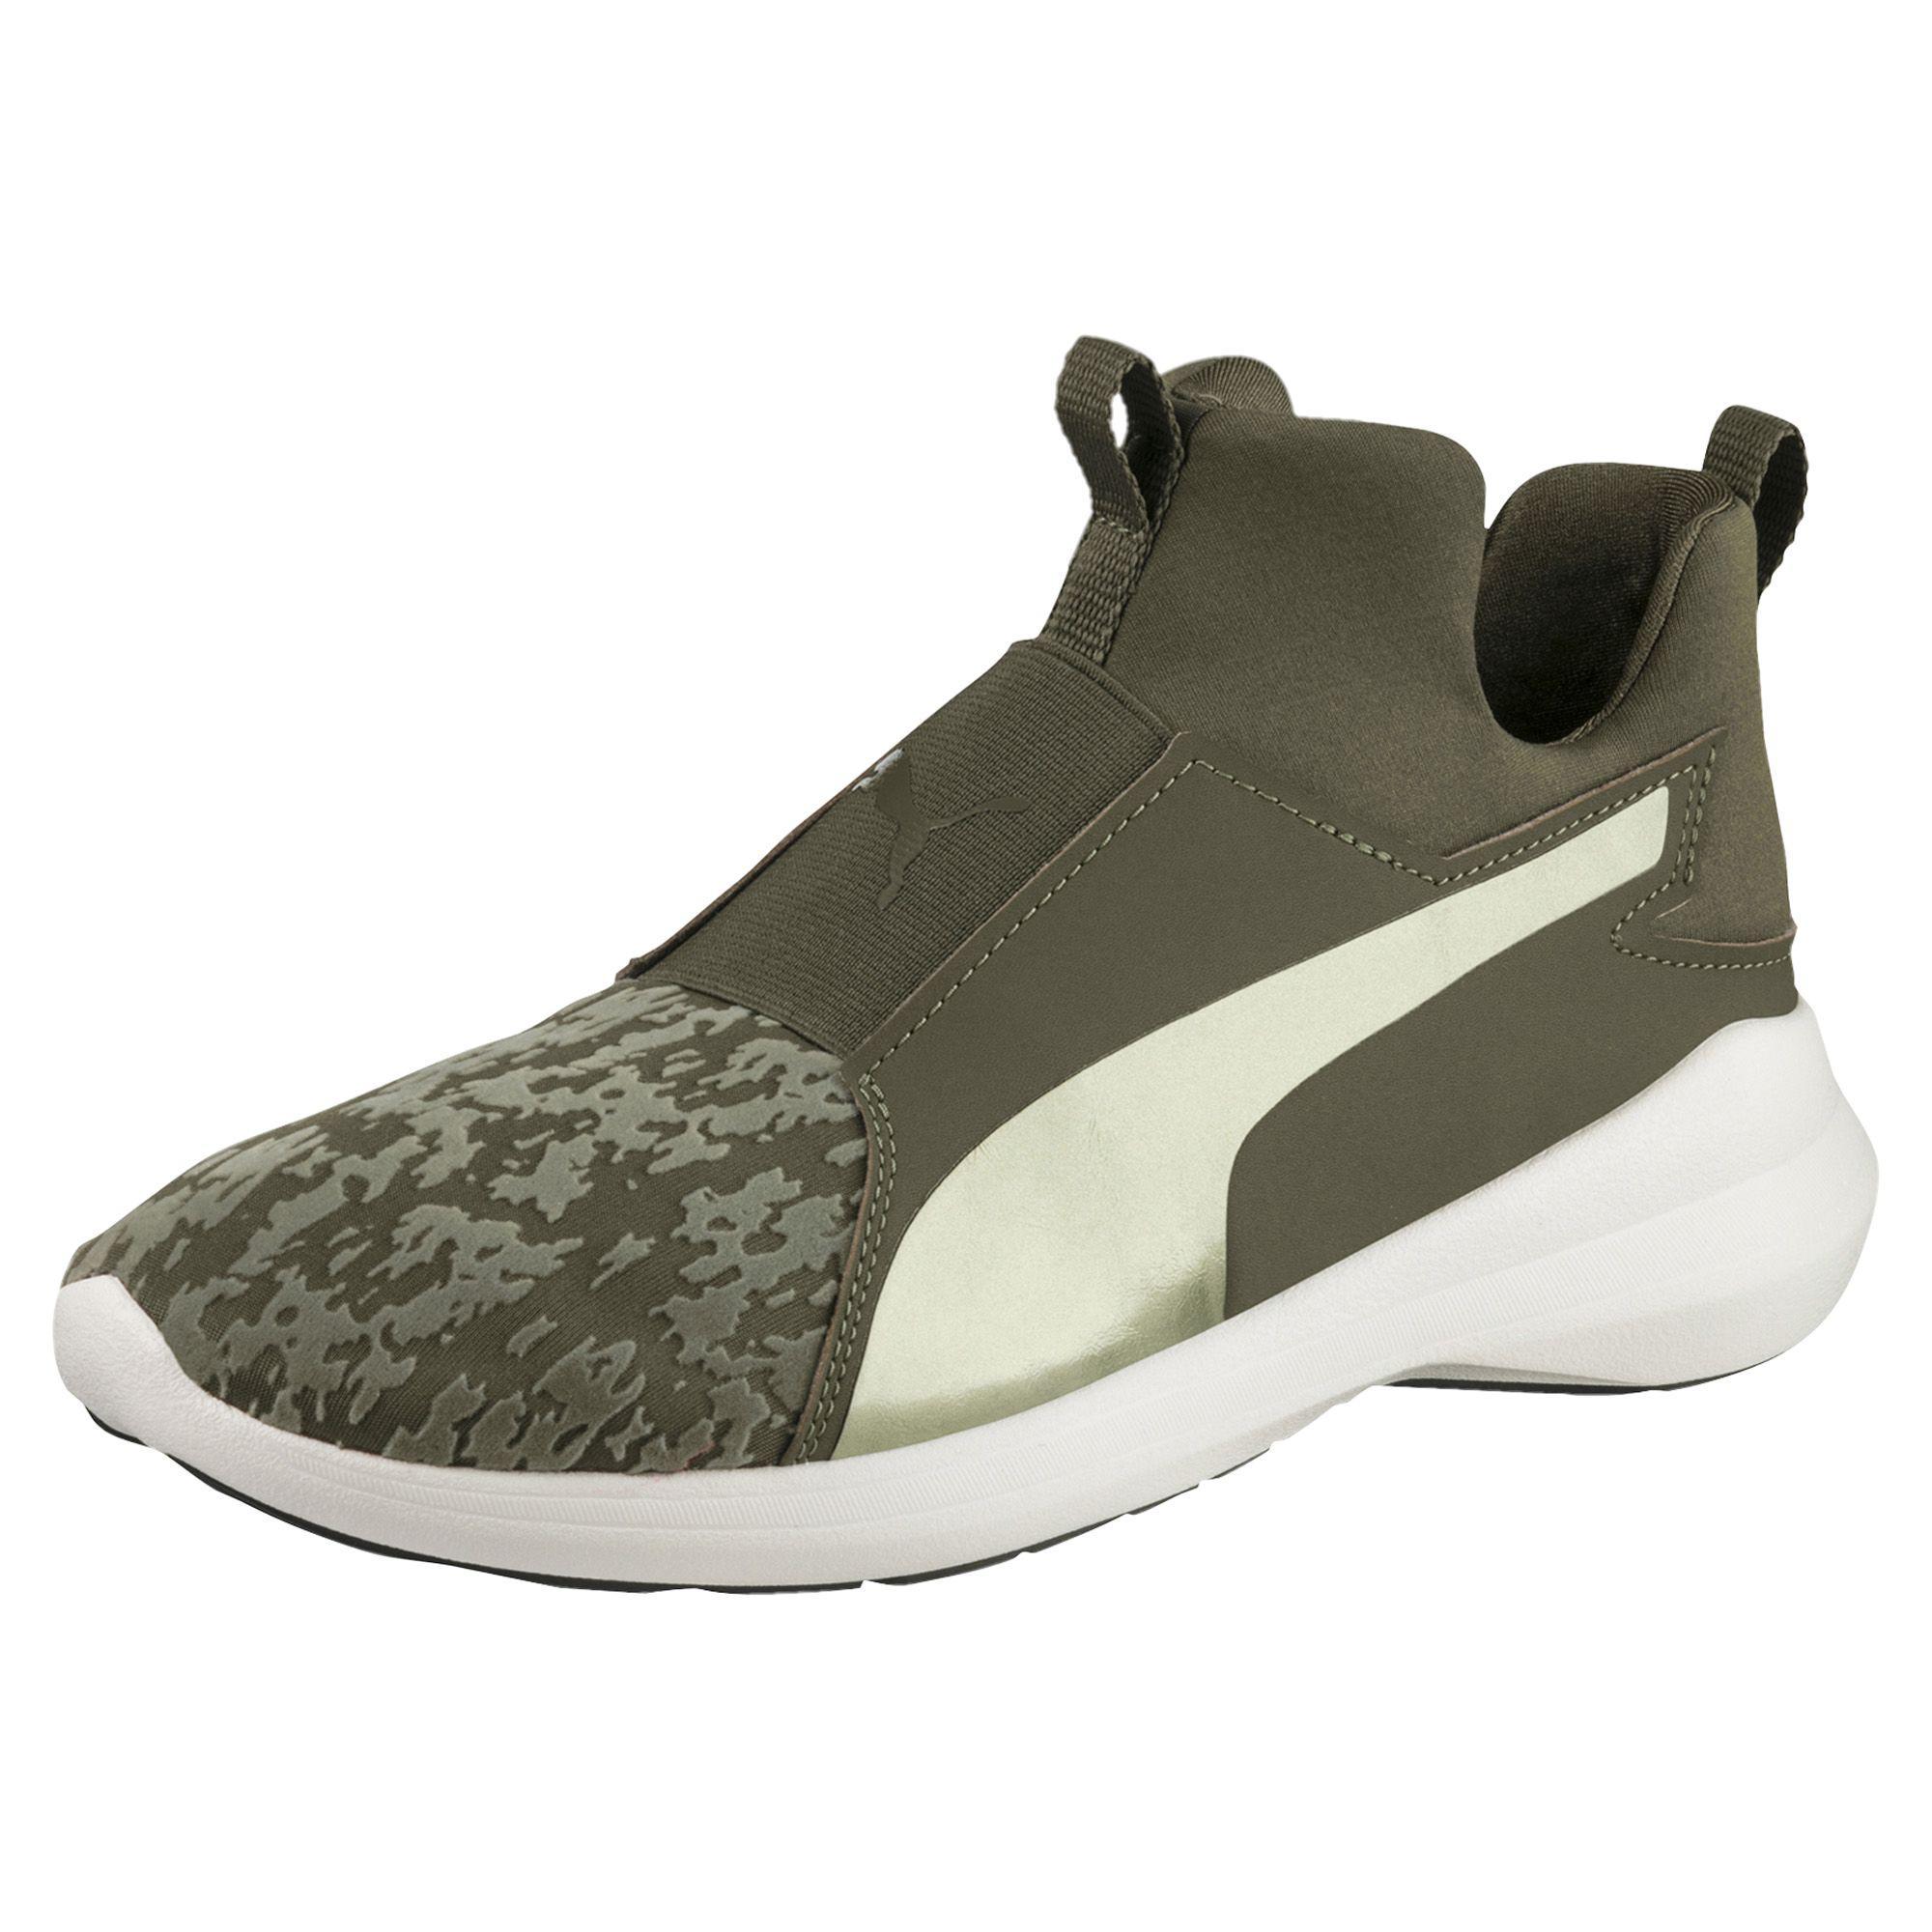 3e8e01c8dfd Lyst - PUMA Rebel Mid Vr Women s Training Shoes in Green